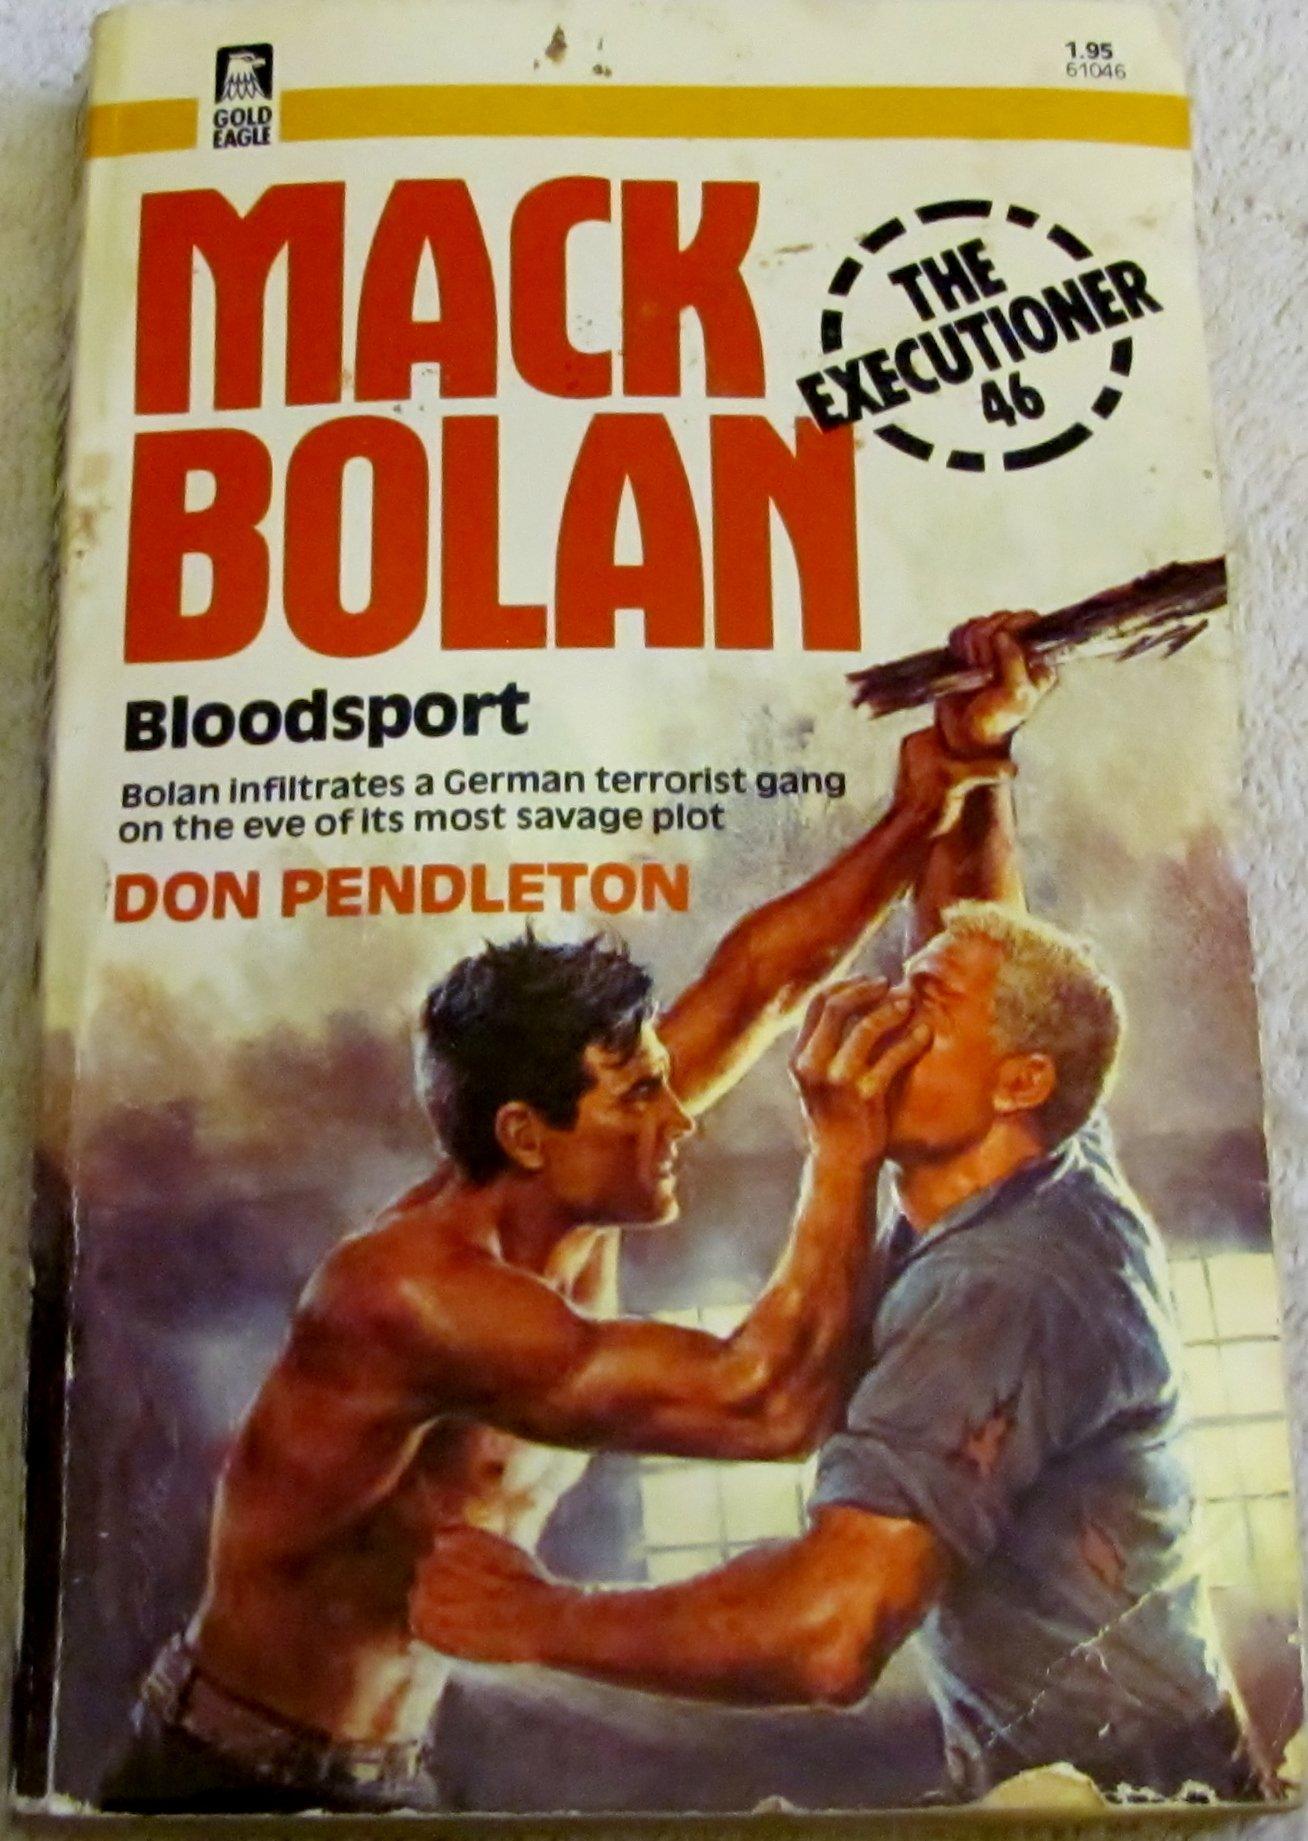 Mack Bolan - Bloodsport (The Executioner 46): Don Pendleton: 9780373610464:  Amazon.com: Books